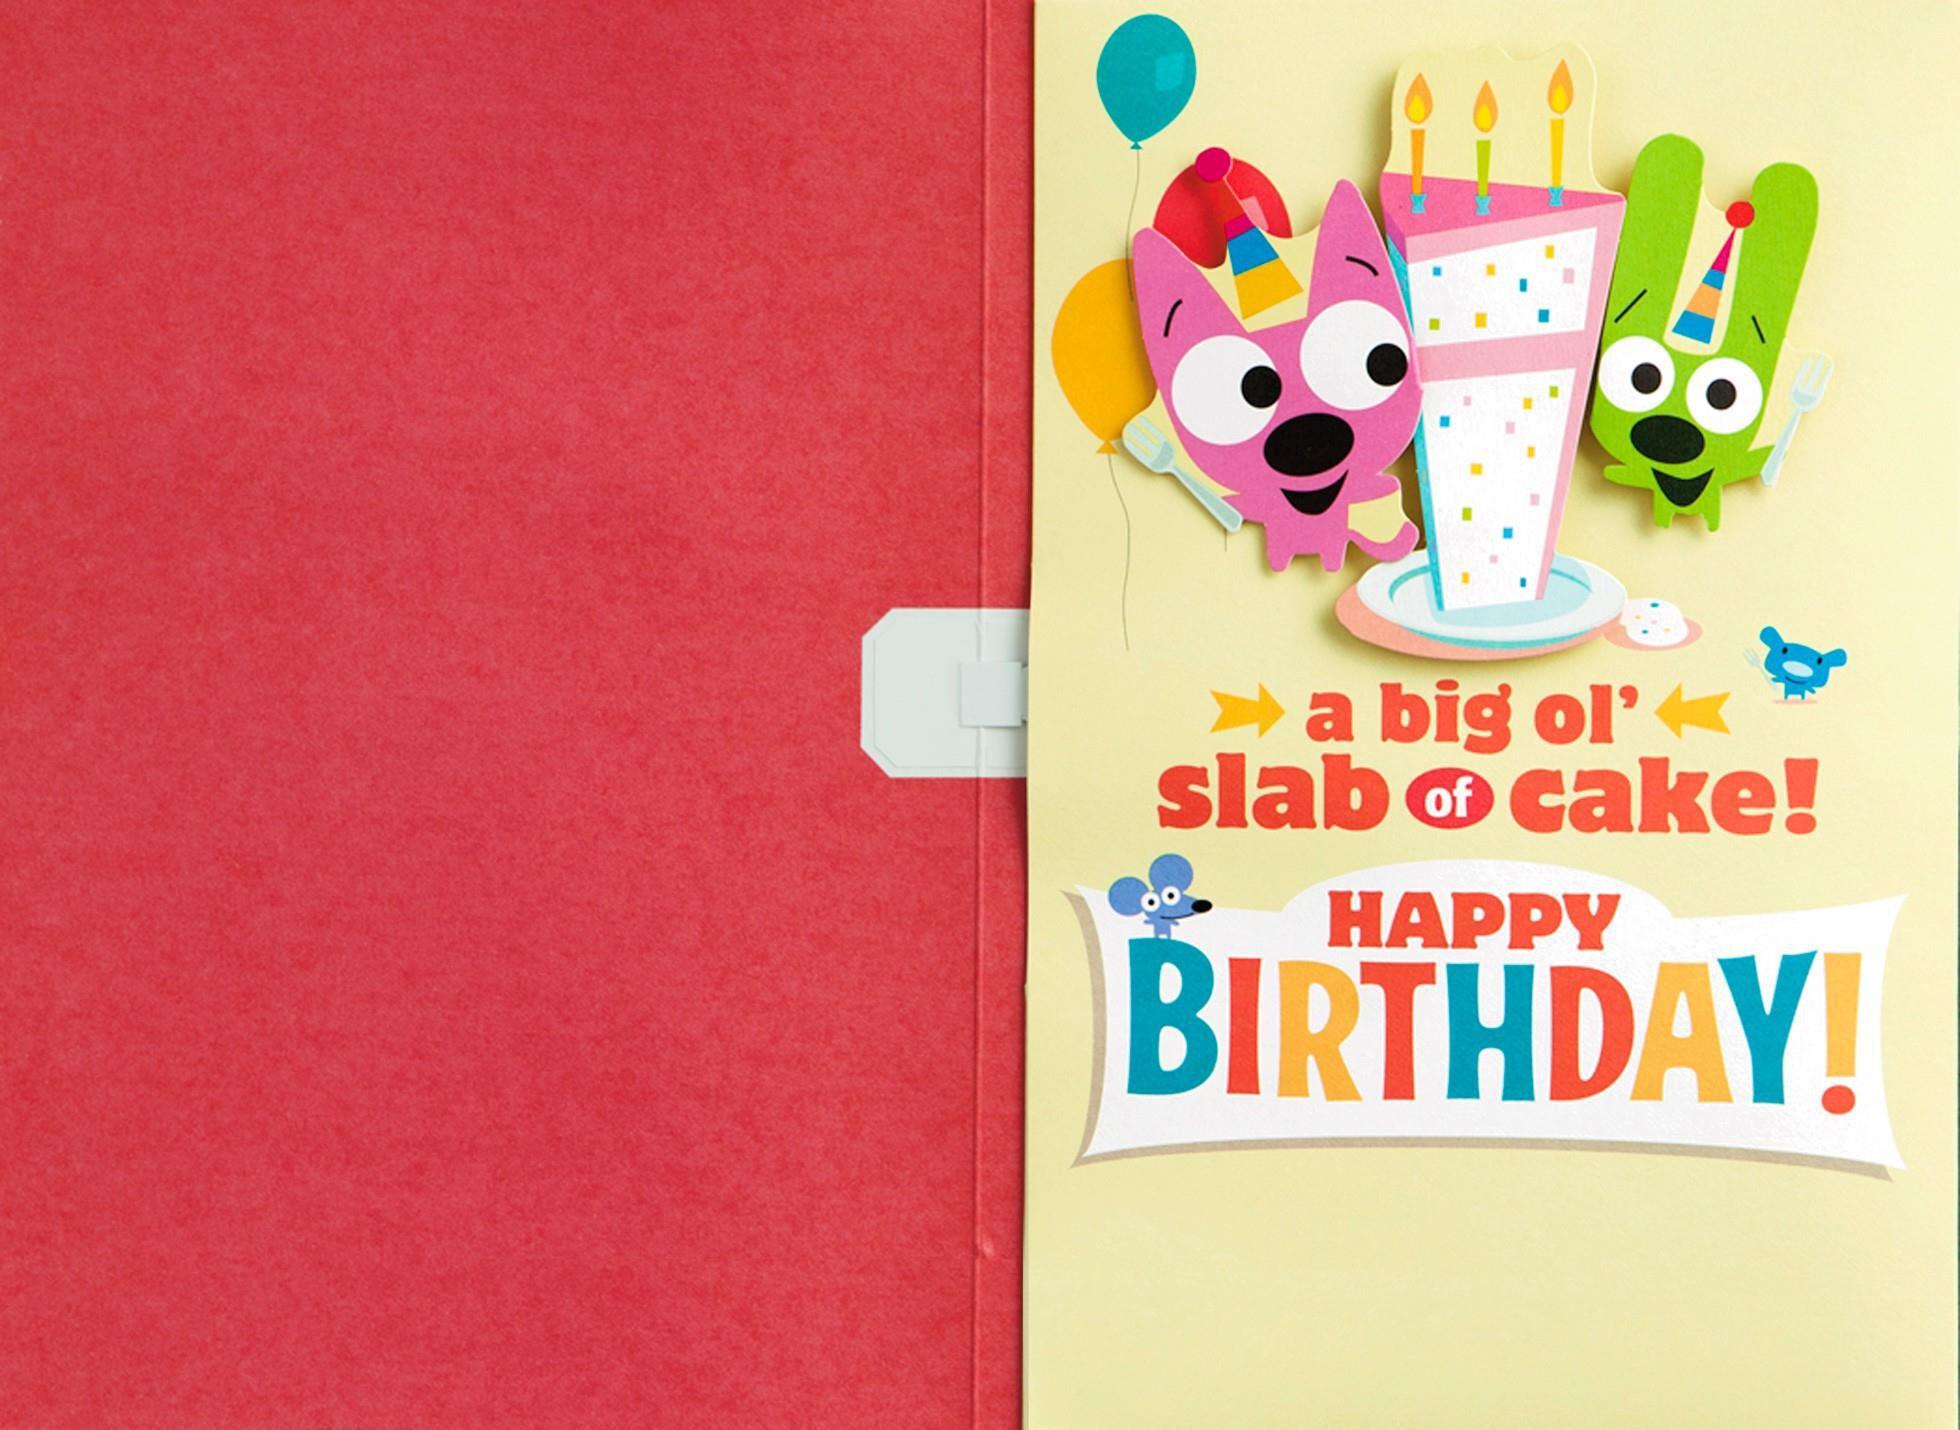 Hoops Amp Yoyo Cake Birthday Sound Card With Motion